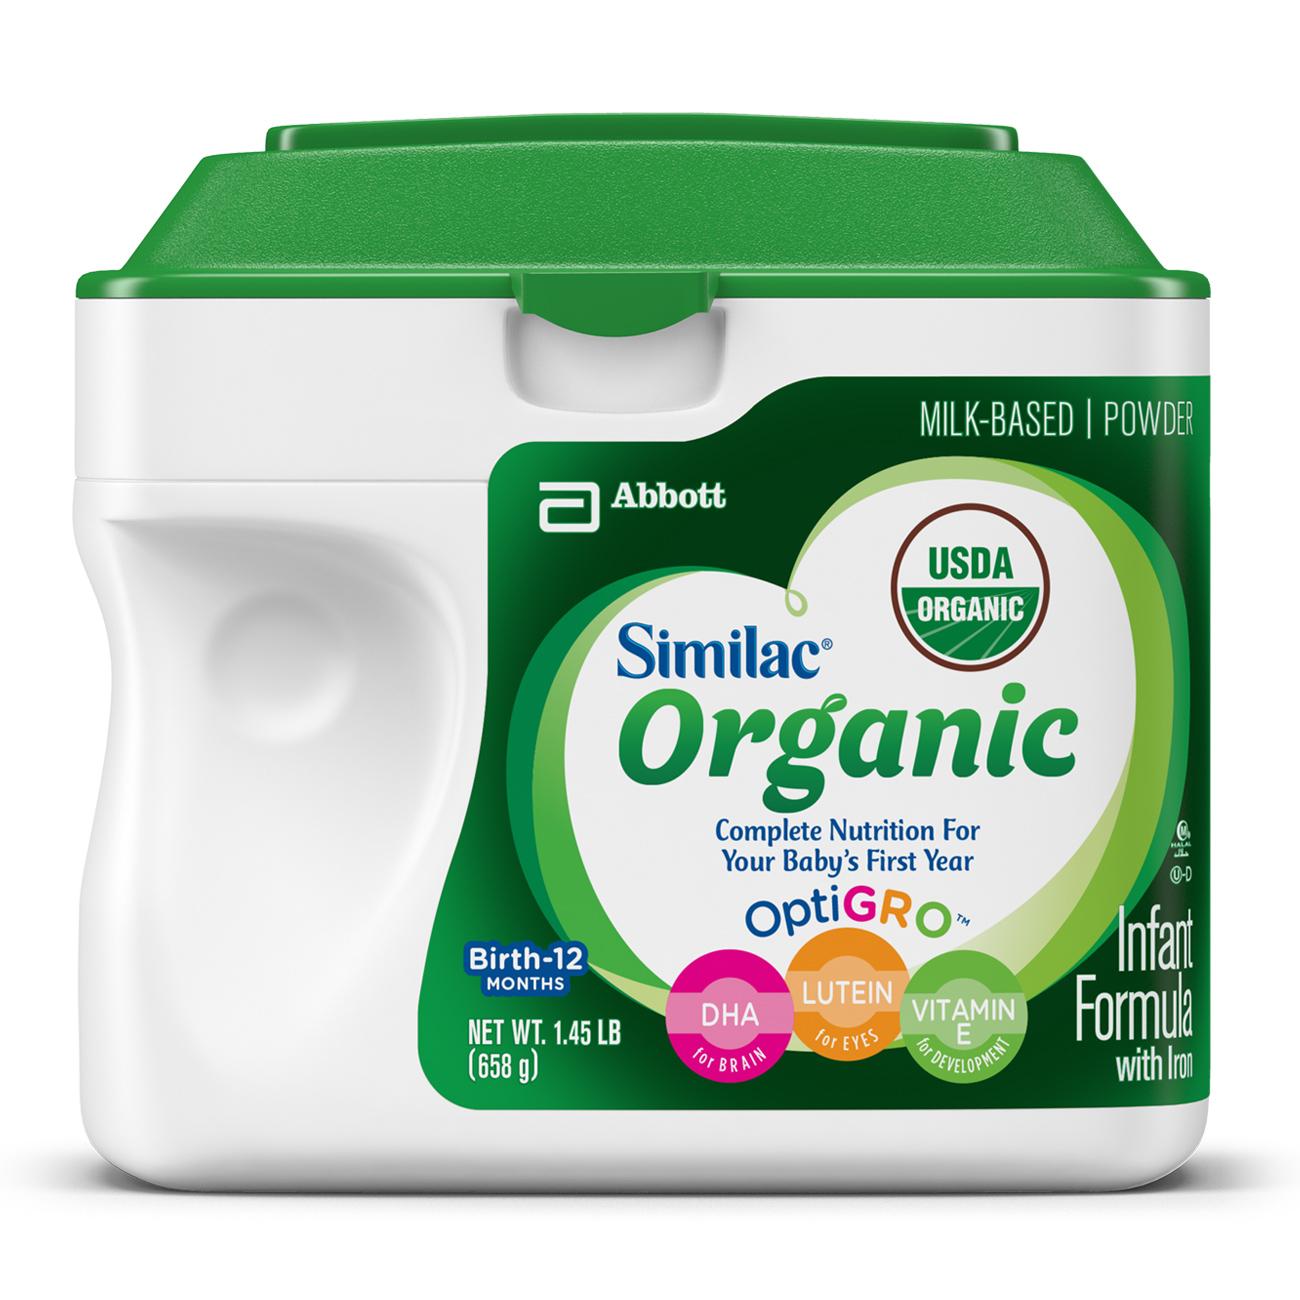 Similac Organic NON-GMO Infant Formula with Iron, Powder, 1.45 lb